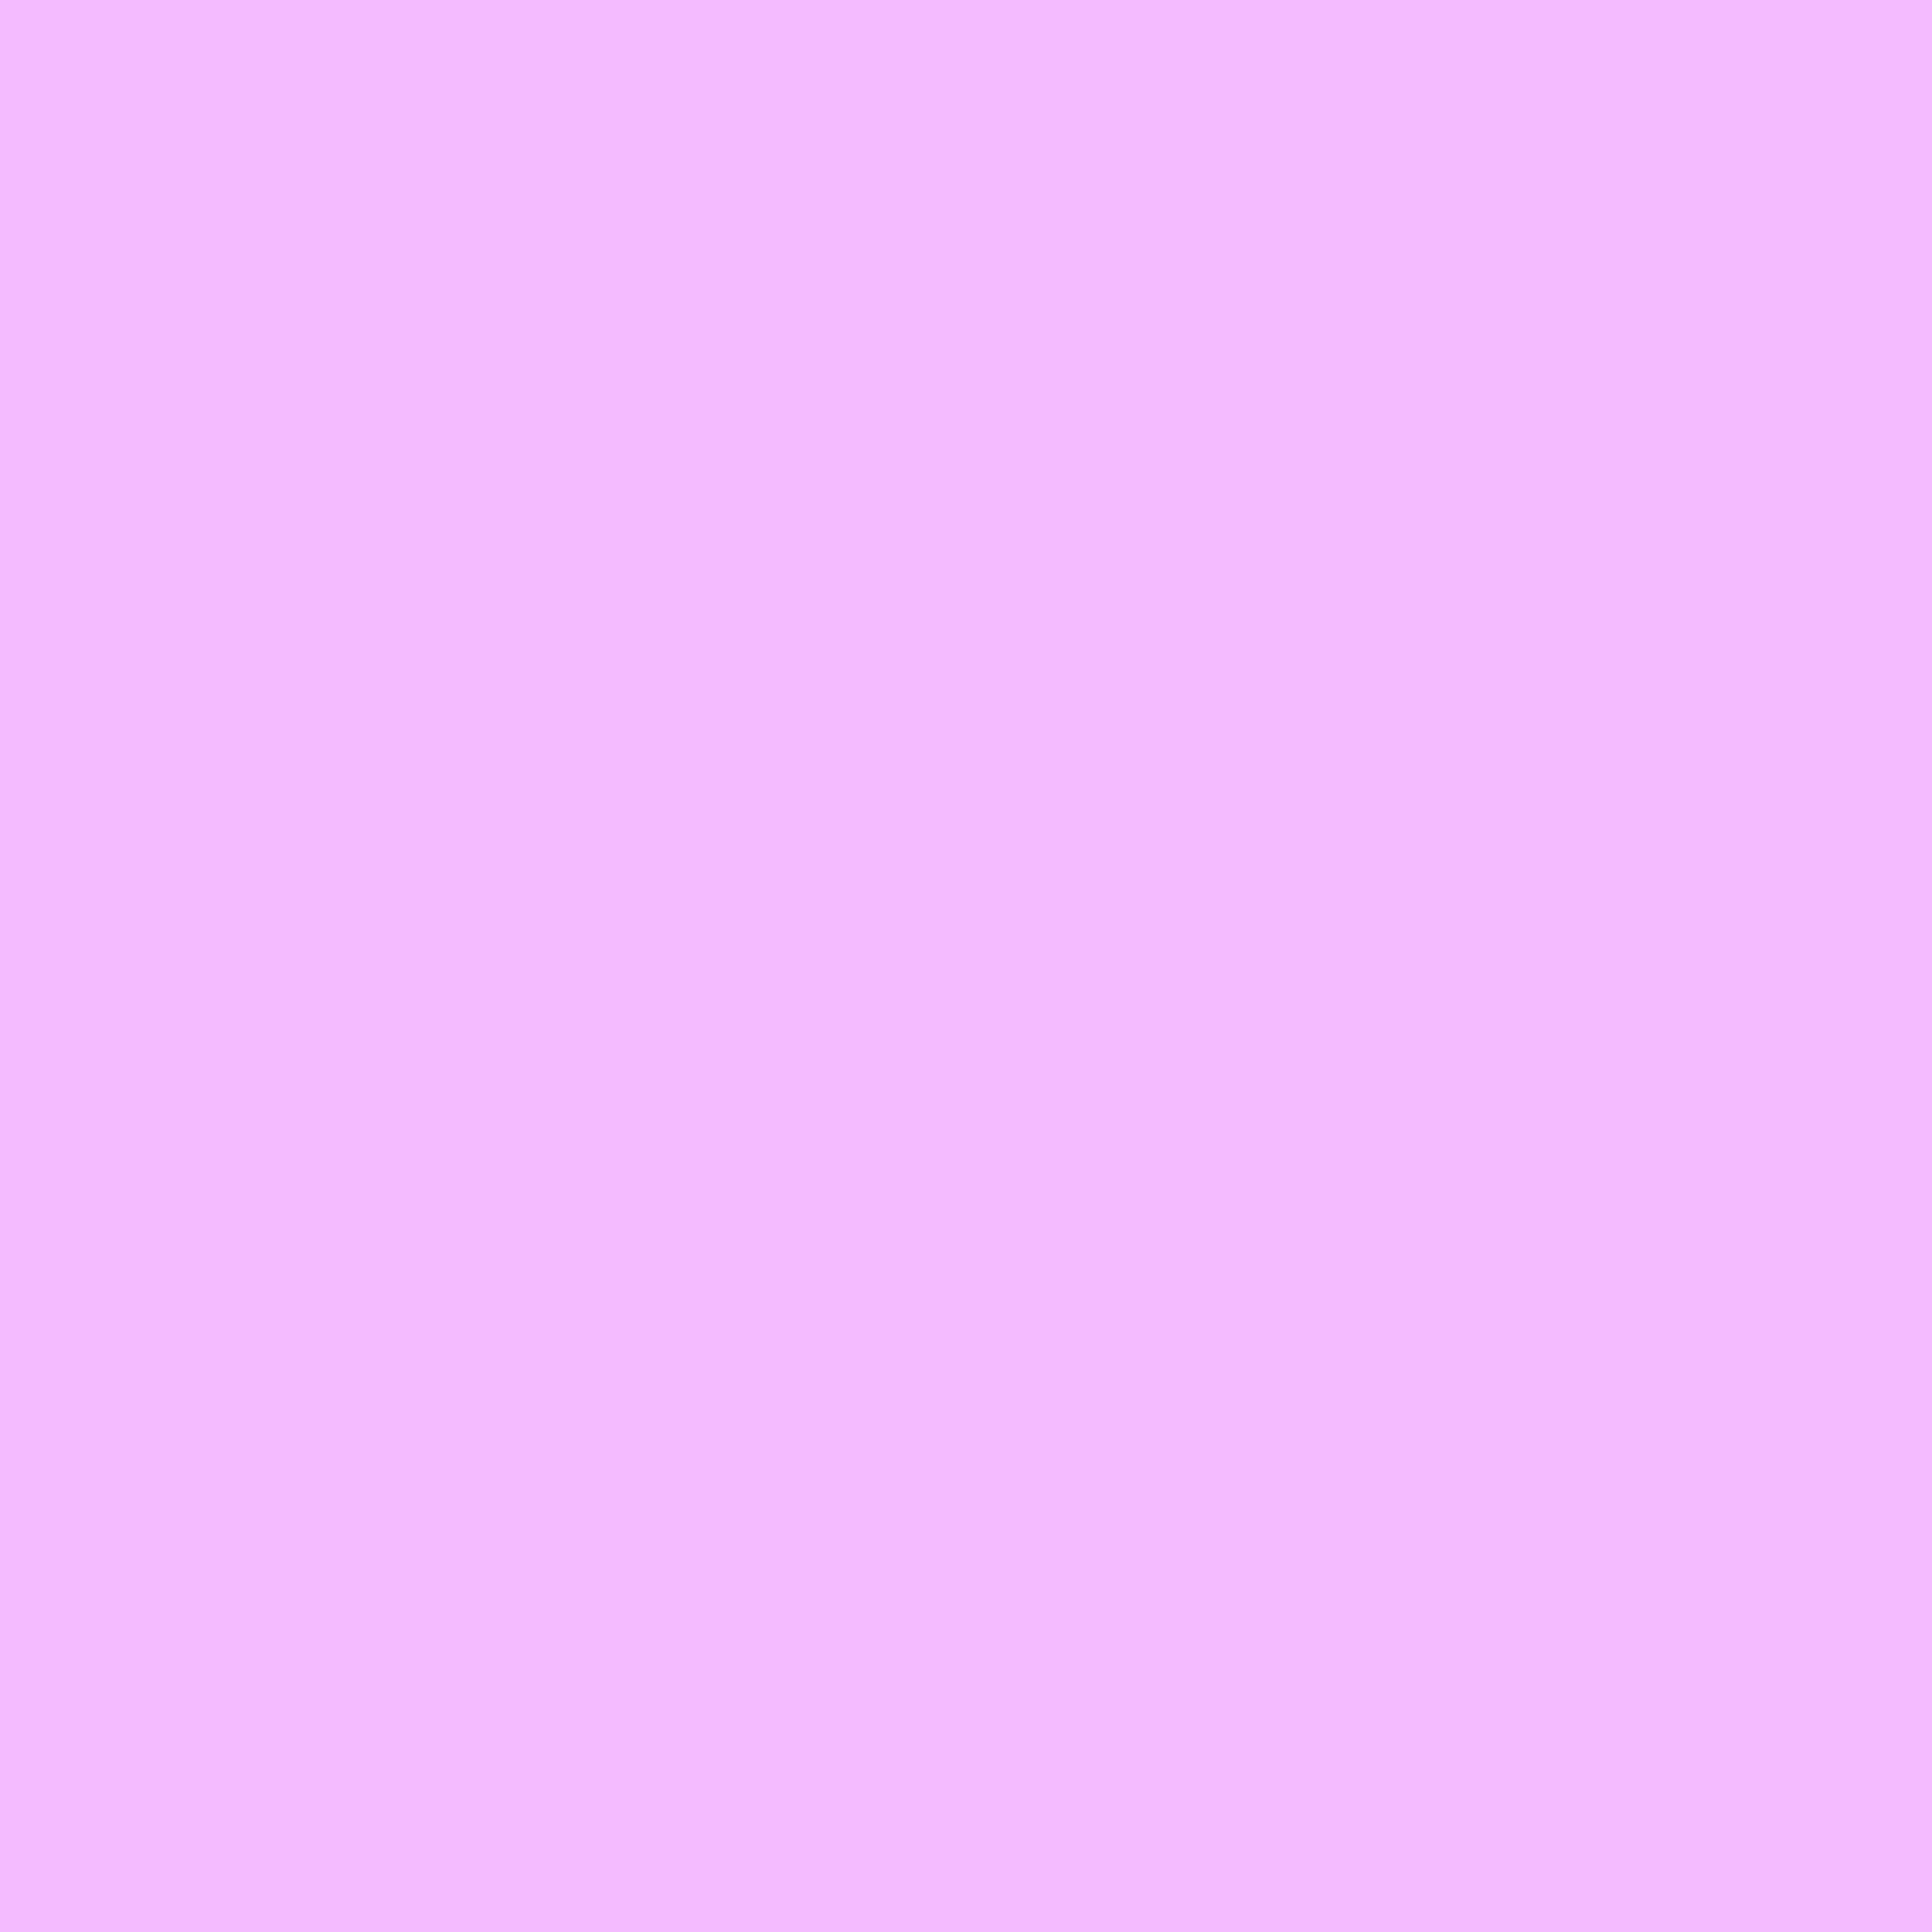 2048x2048 Brilliant Lavender Solid Color Background